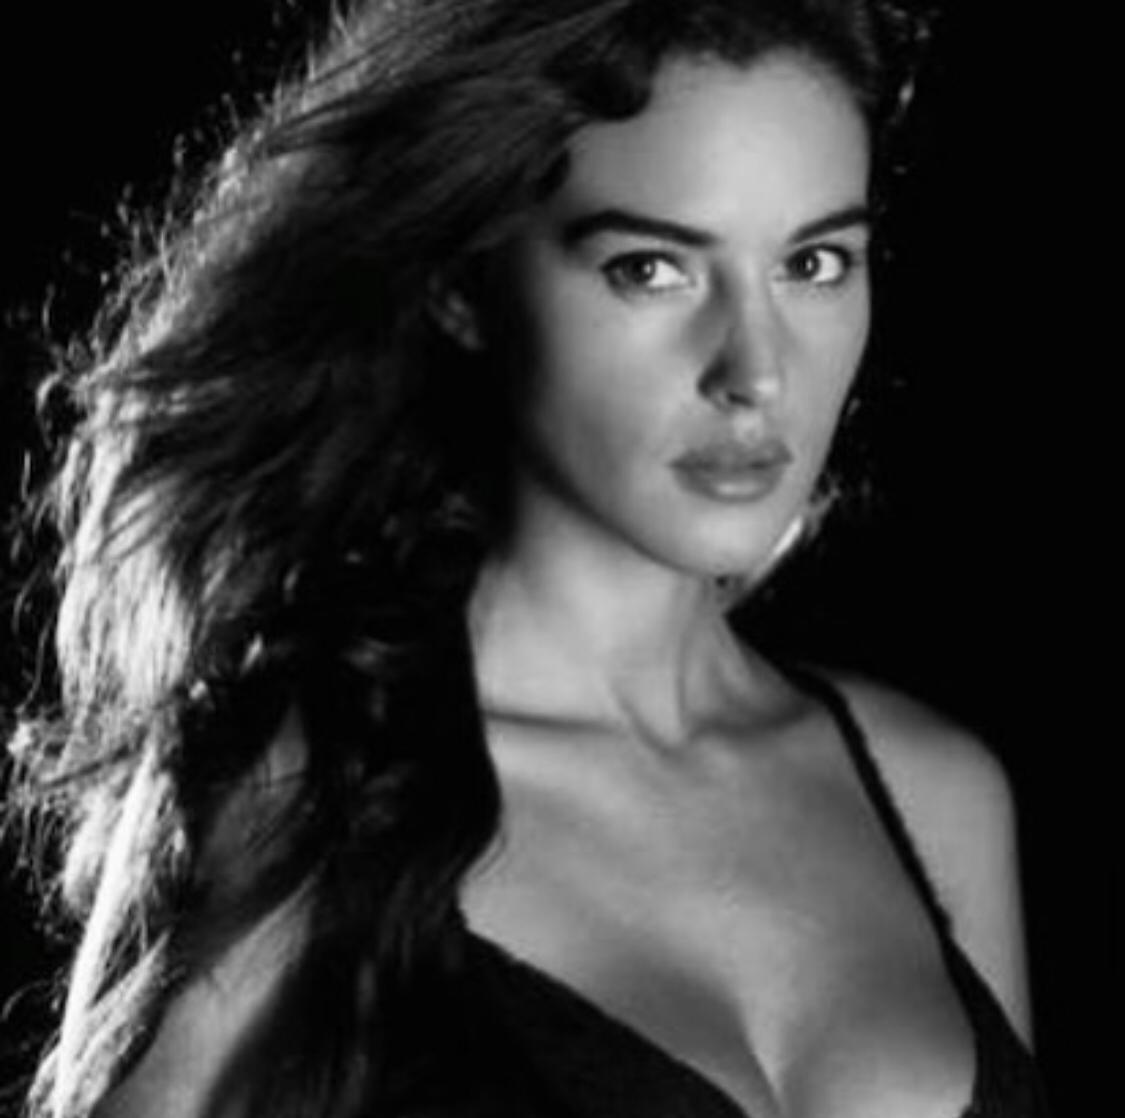 مونيكا بيلوتشي  (2)